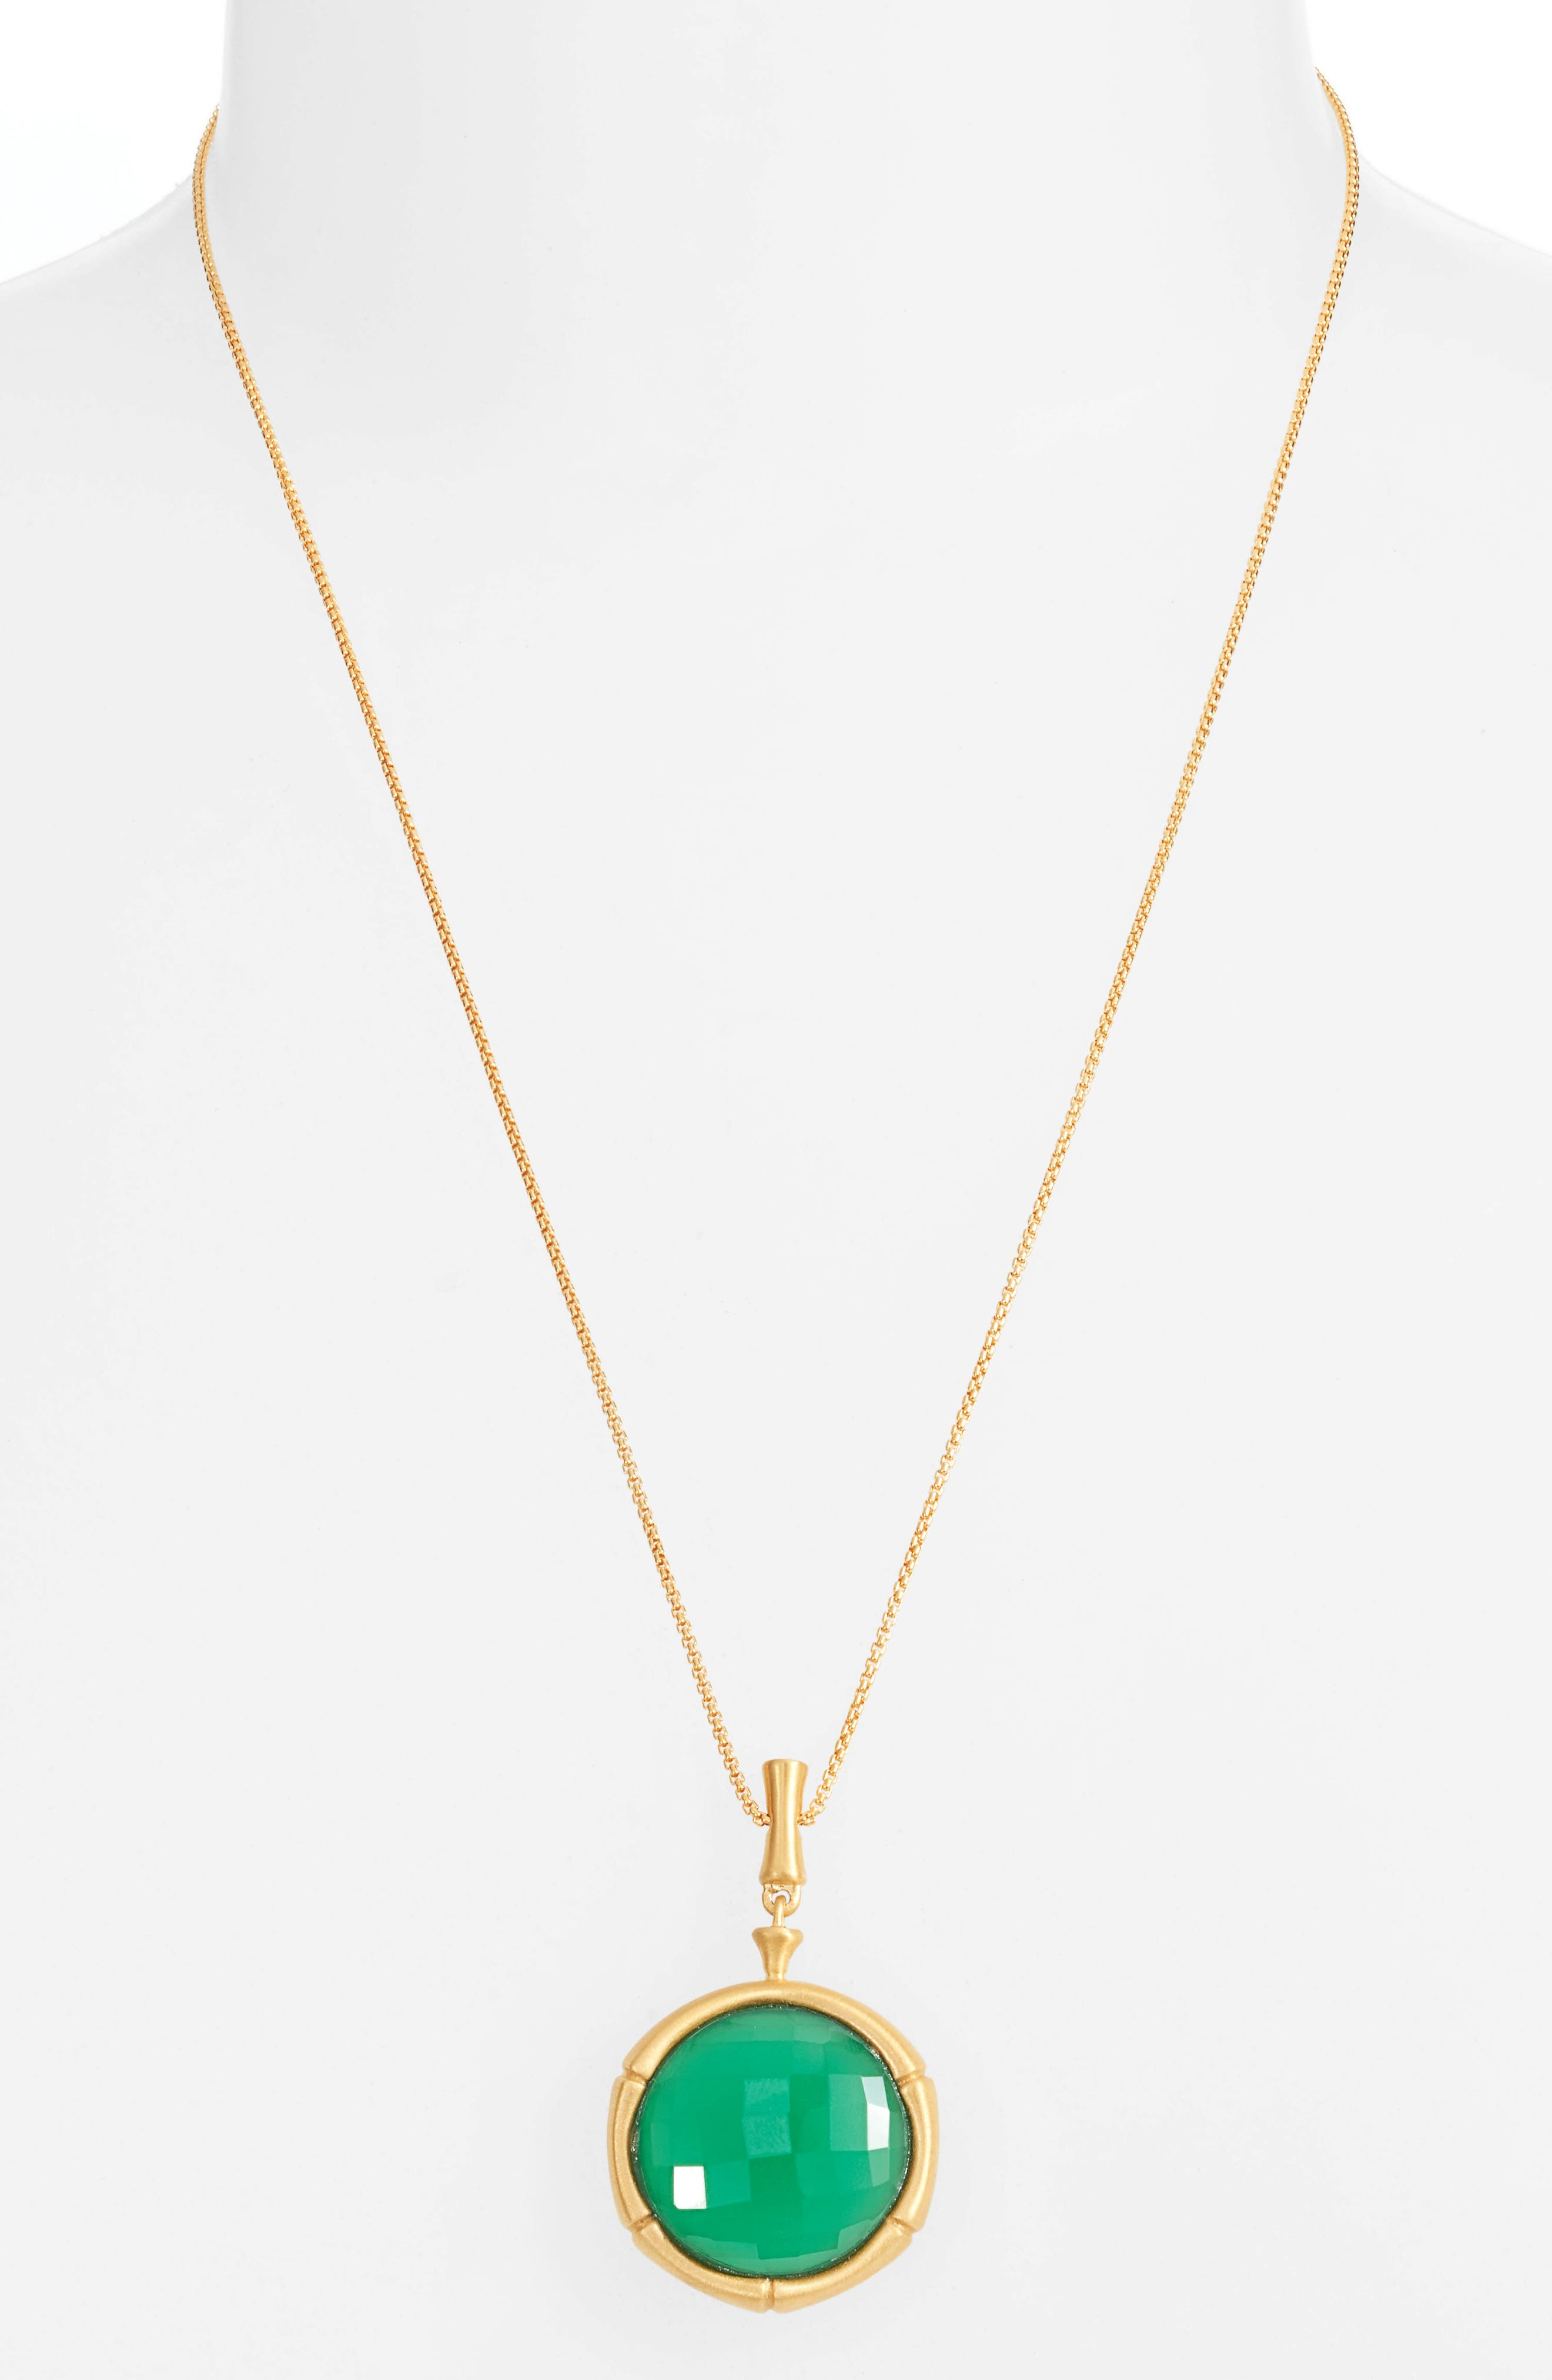 Image of DEAN DAVIDSON Bamboo Gemstone Pendant